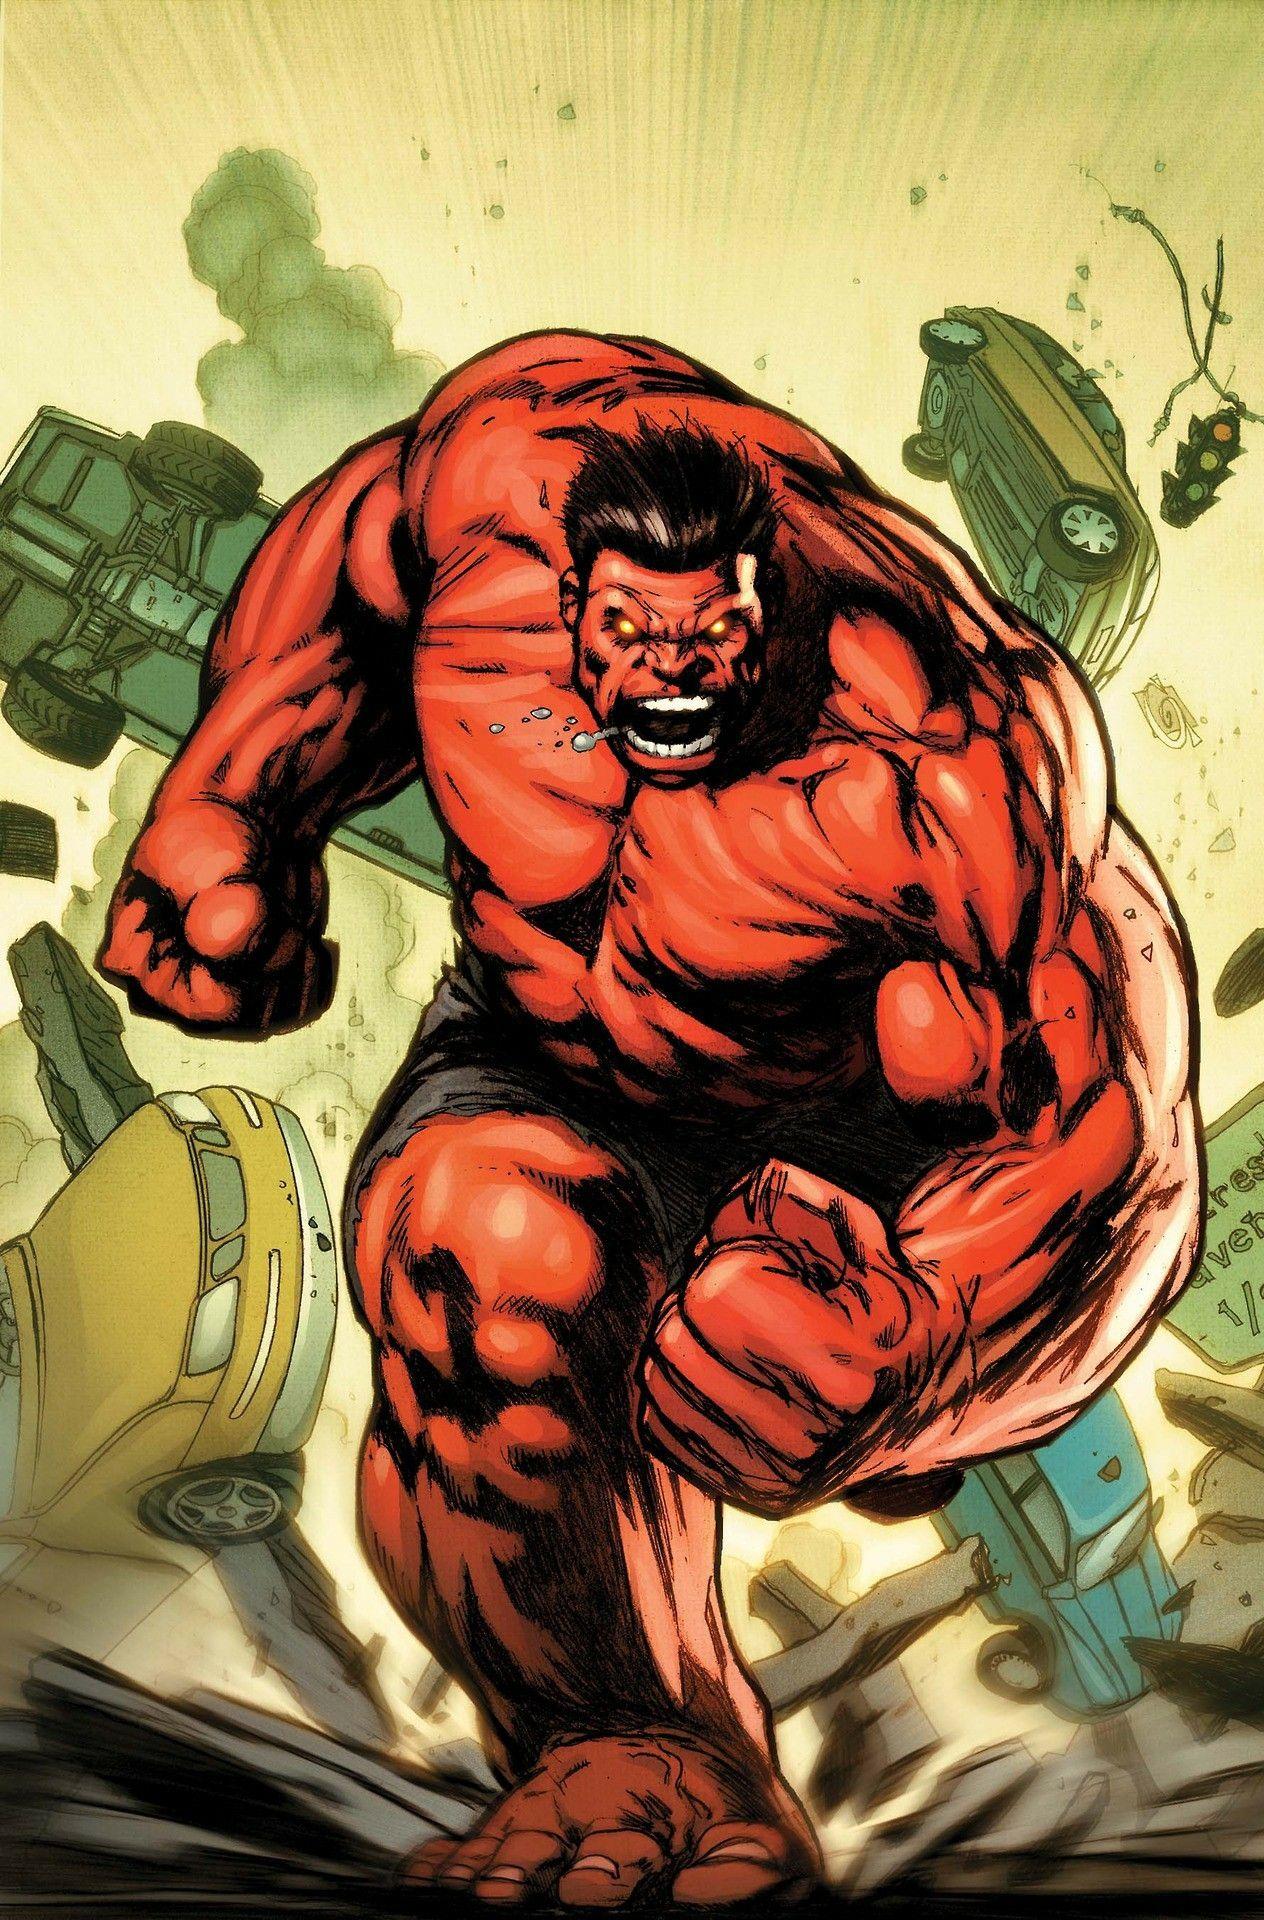 Red Hulk | Hulk vermelho, Comics anime, Desenho do hulk